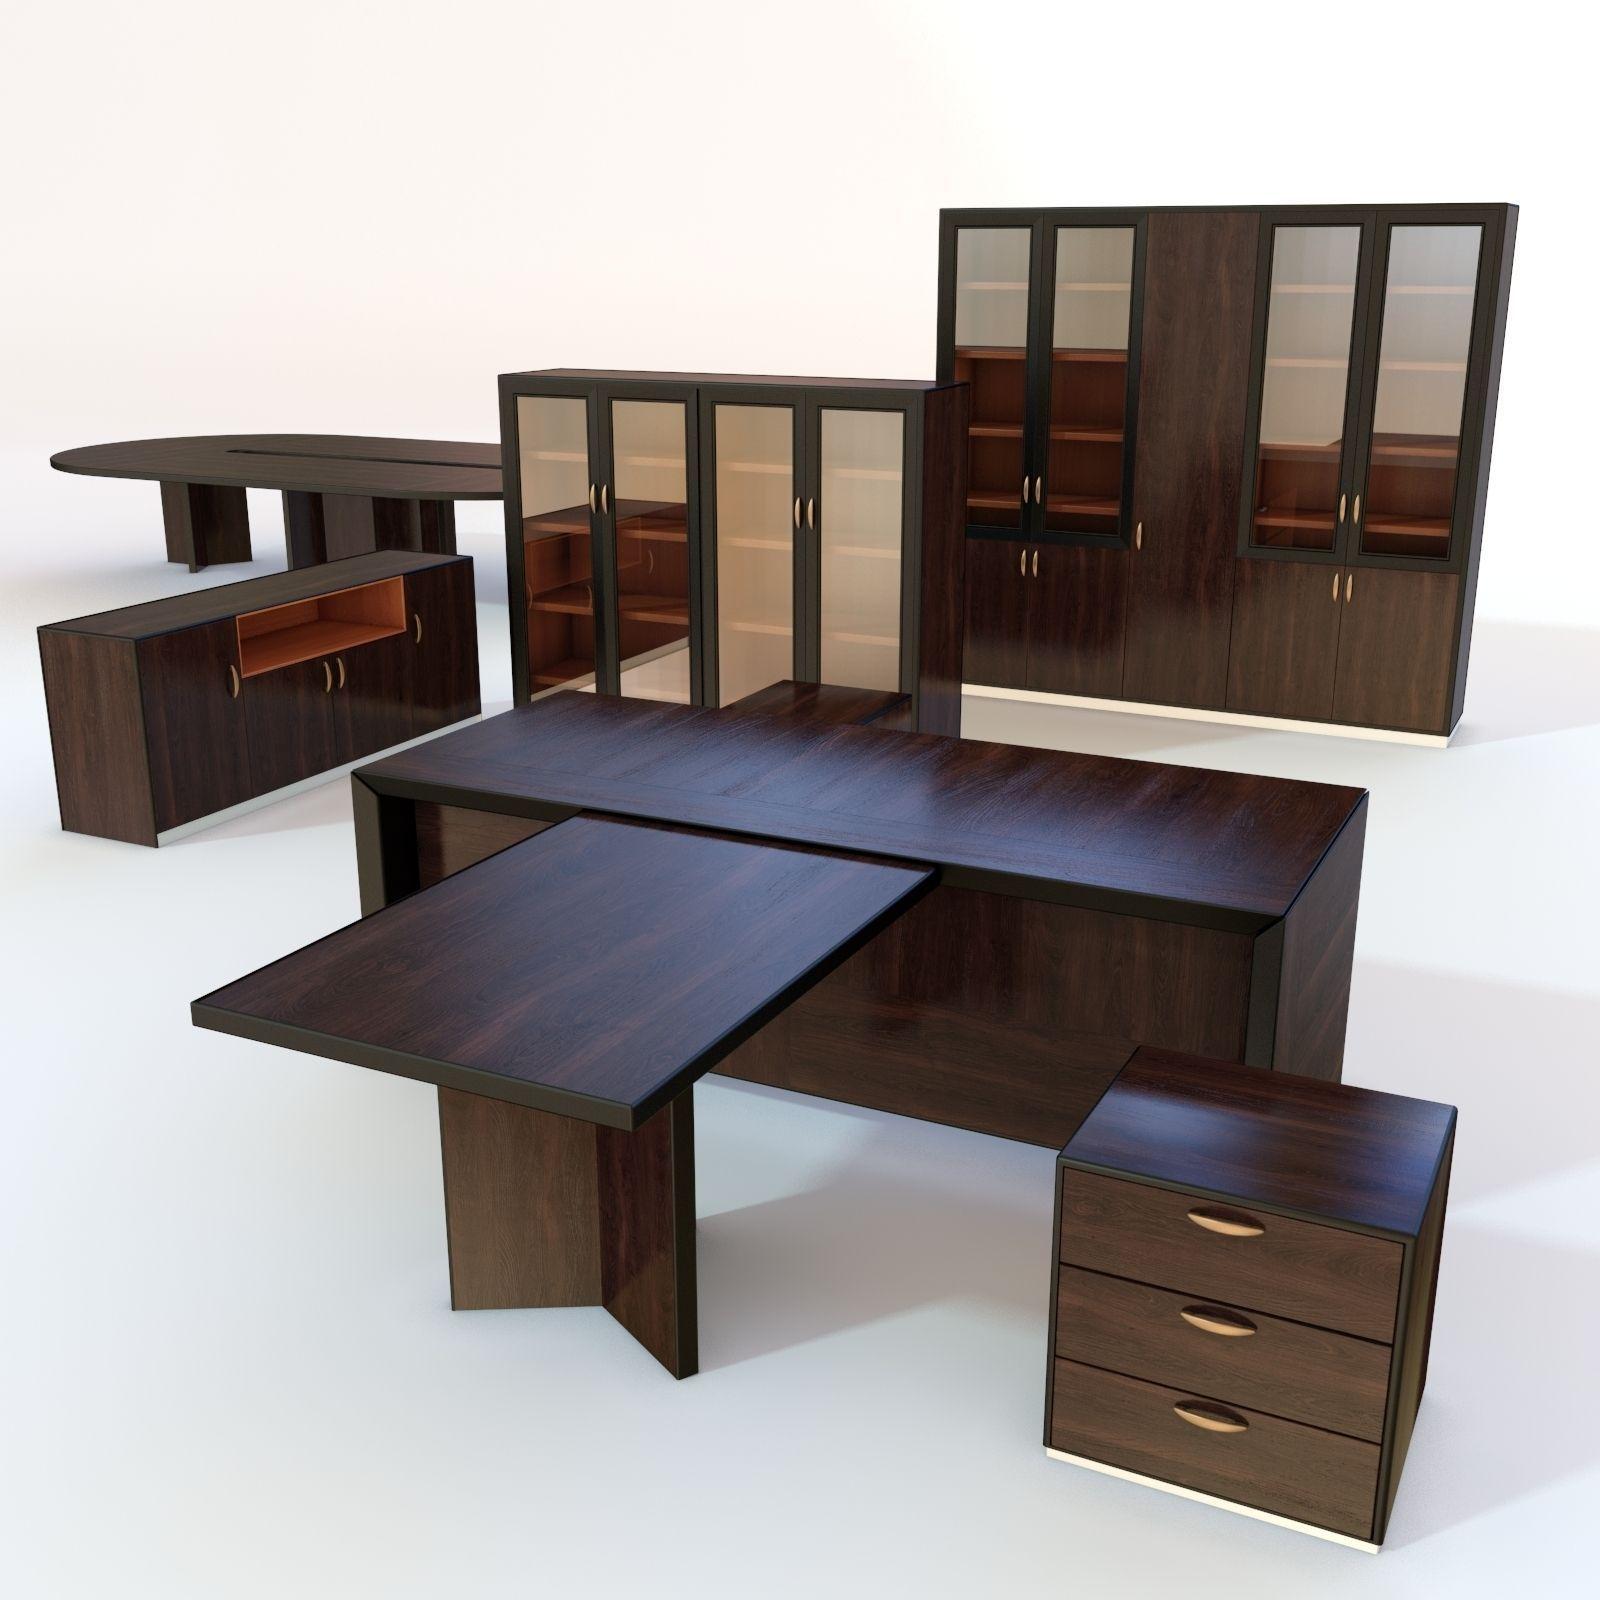 Office Furniture 3 3d Model Low Poly Max Obj 3ds Fbx Mtl 1